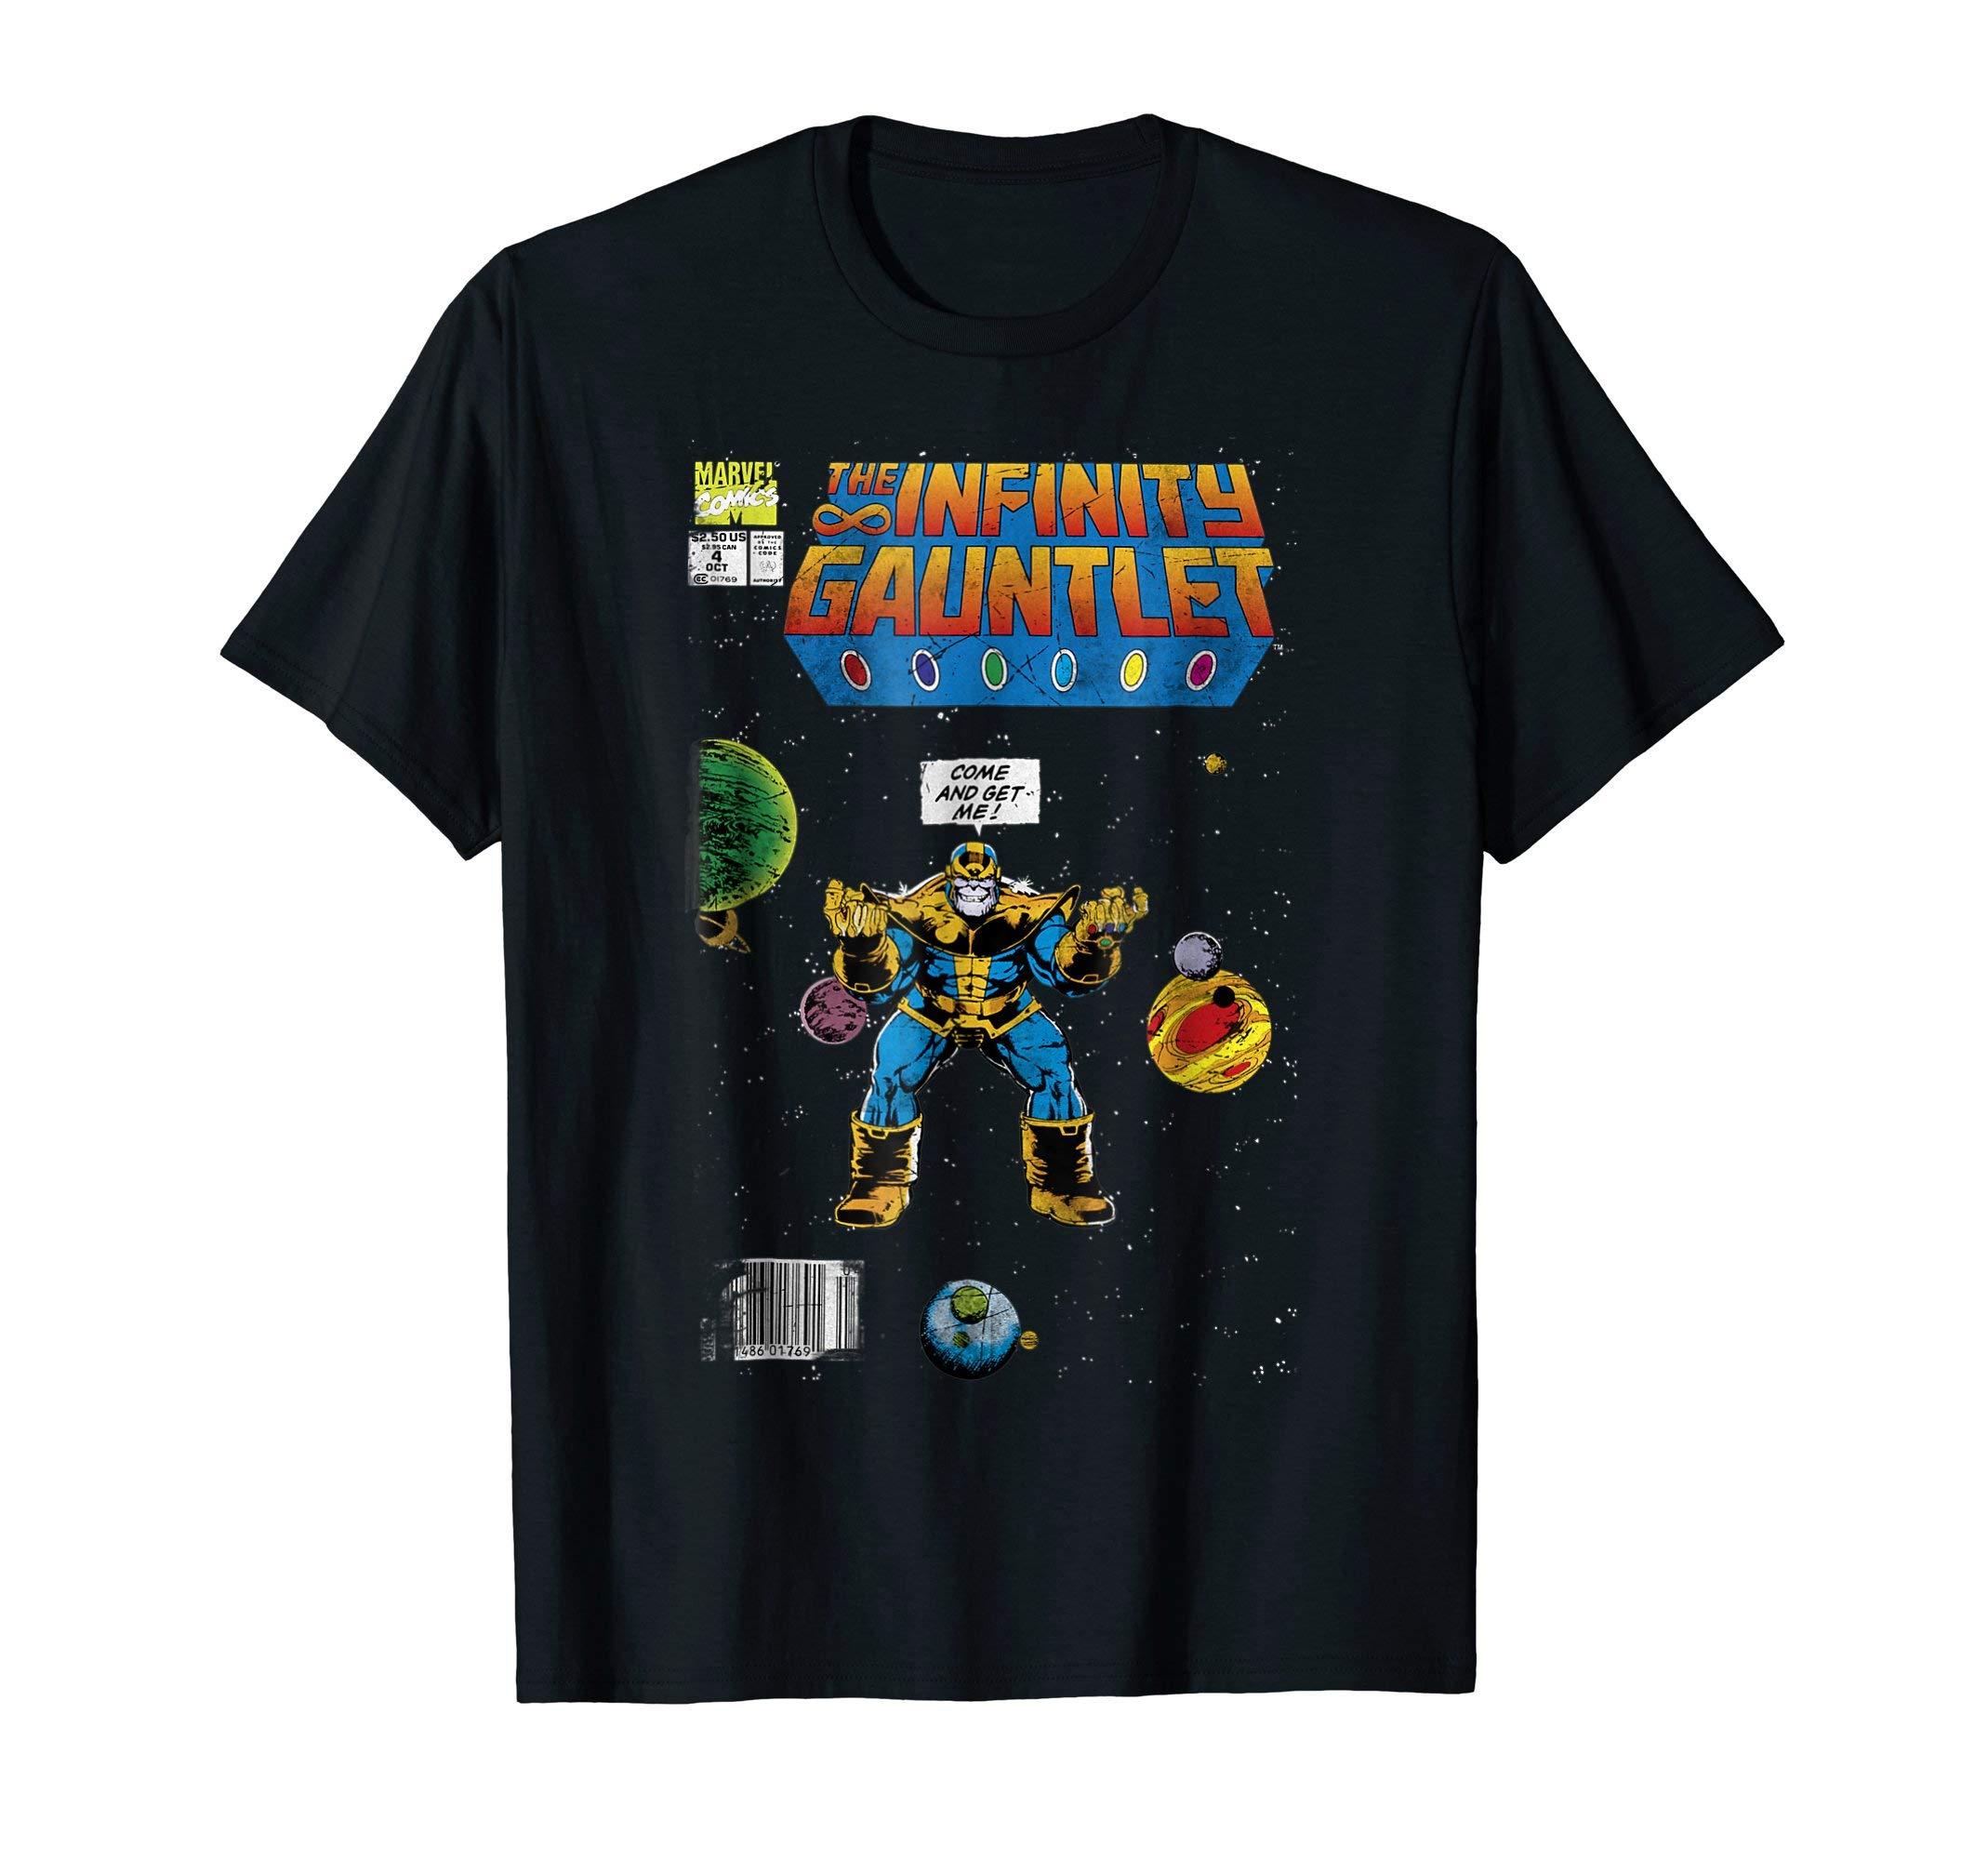 Infinity Gauntlet Comic Book Graphic T Shirt 1116